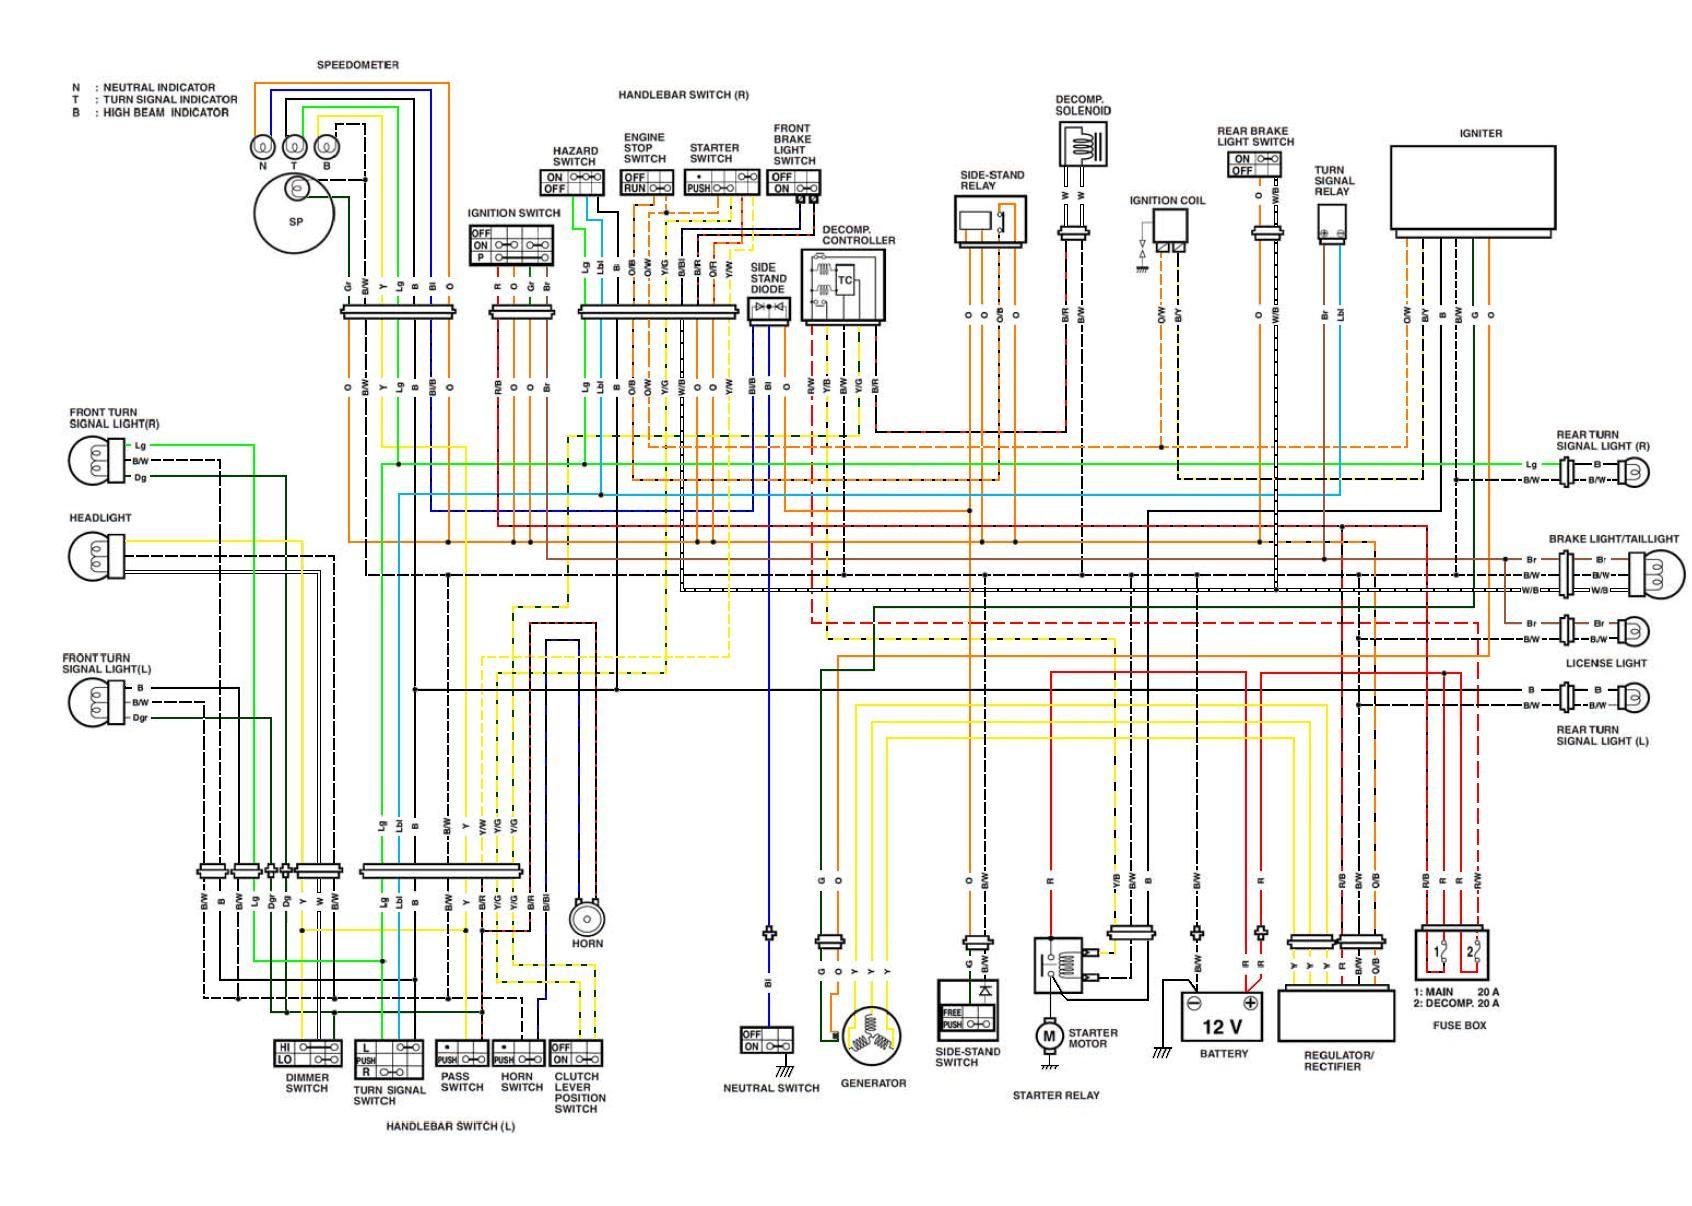 ... harley davidson wiring diagram download wiring diagram image 1974 Harley -Davidson FLH Shovelhead best solutions